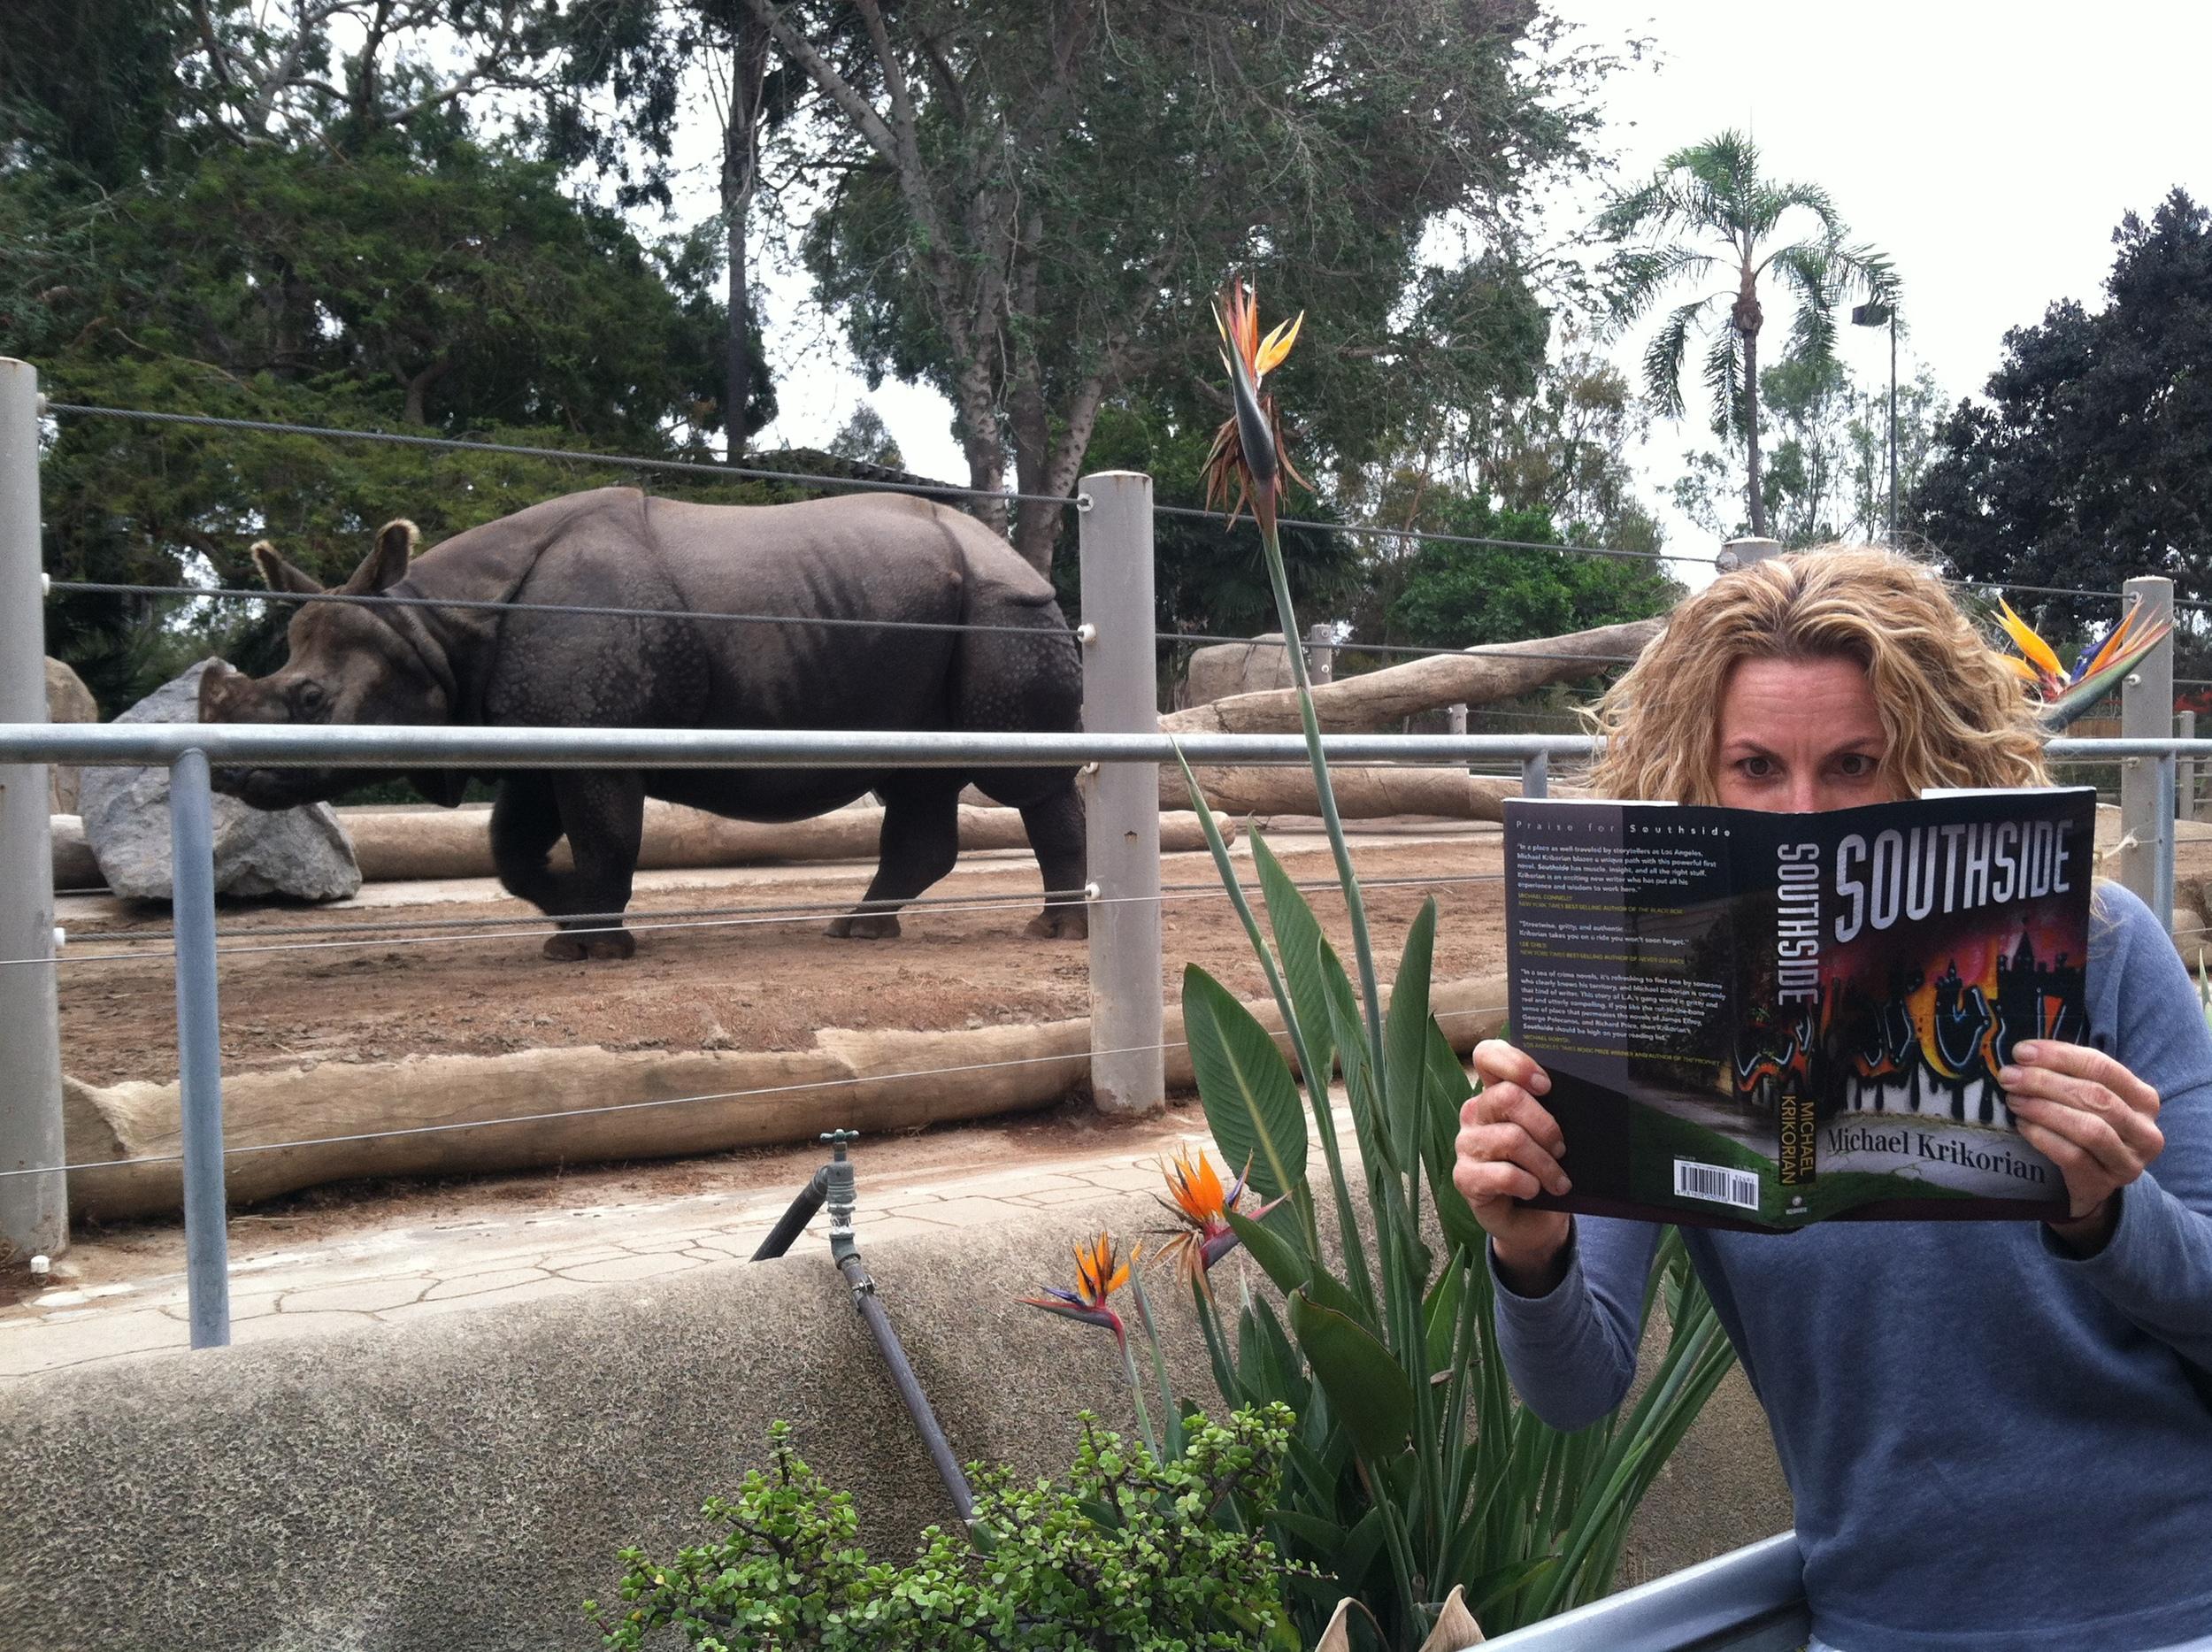 Zoo visitorignores Calcutta Slim